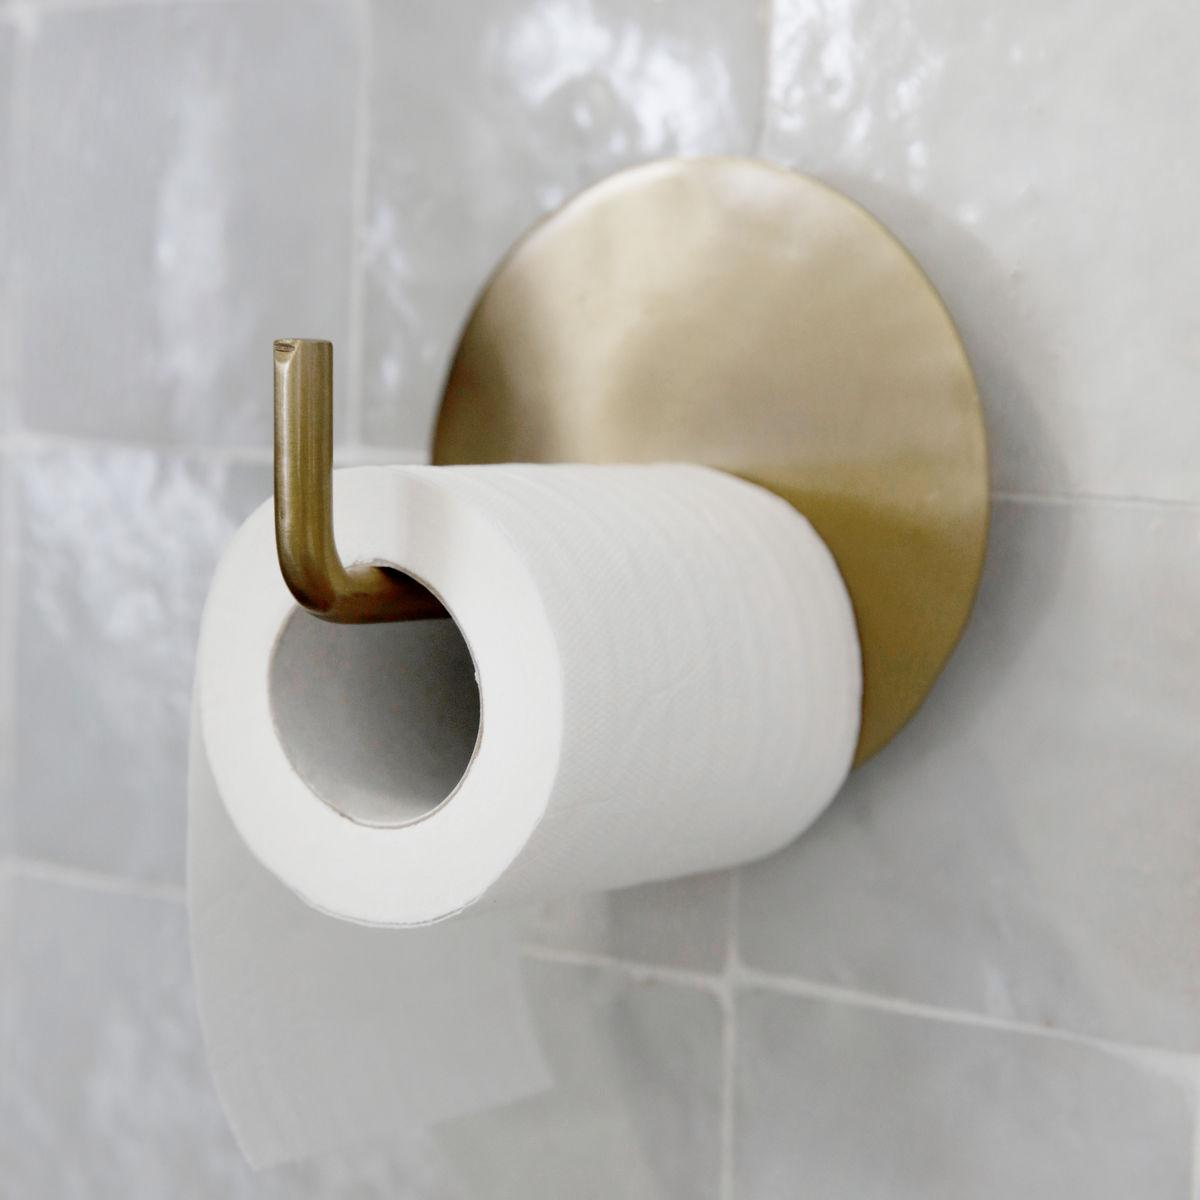 Sada 2 ks − Mosazný držák na toaletní papír Text